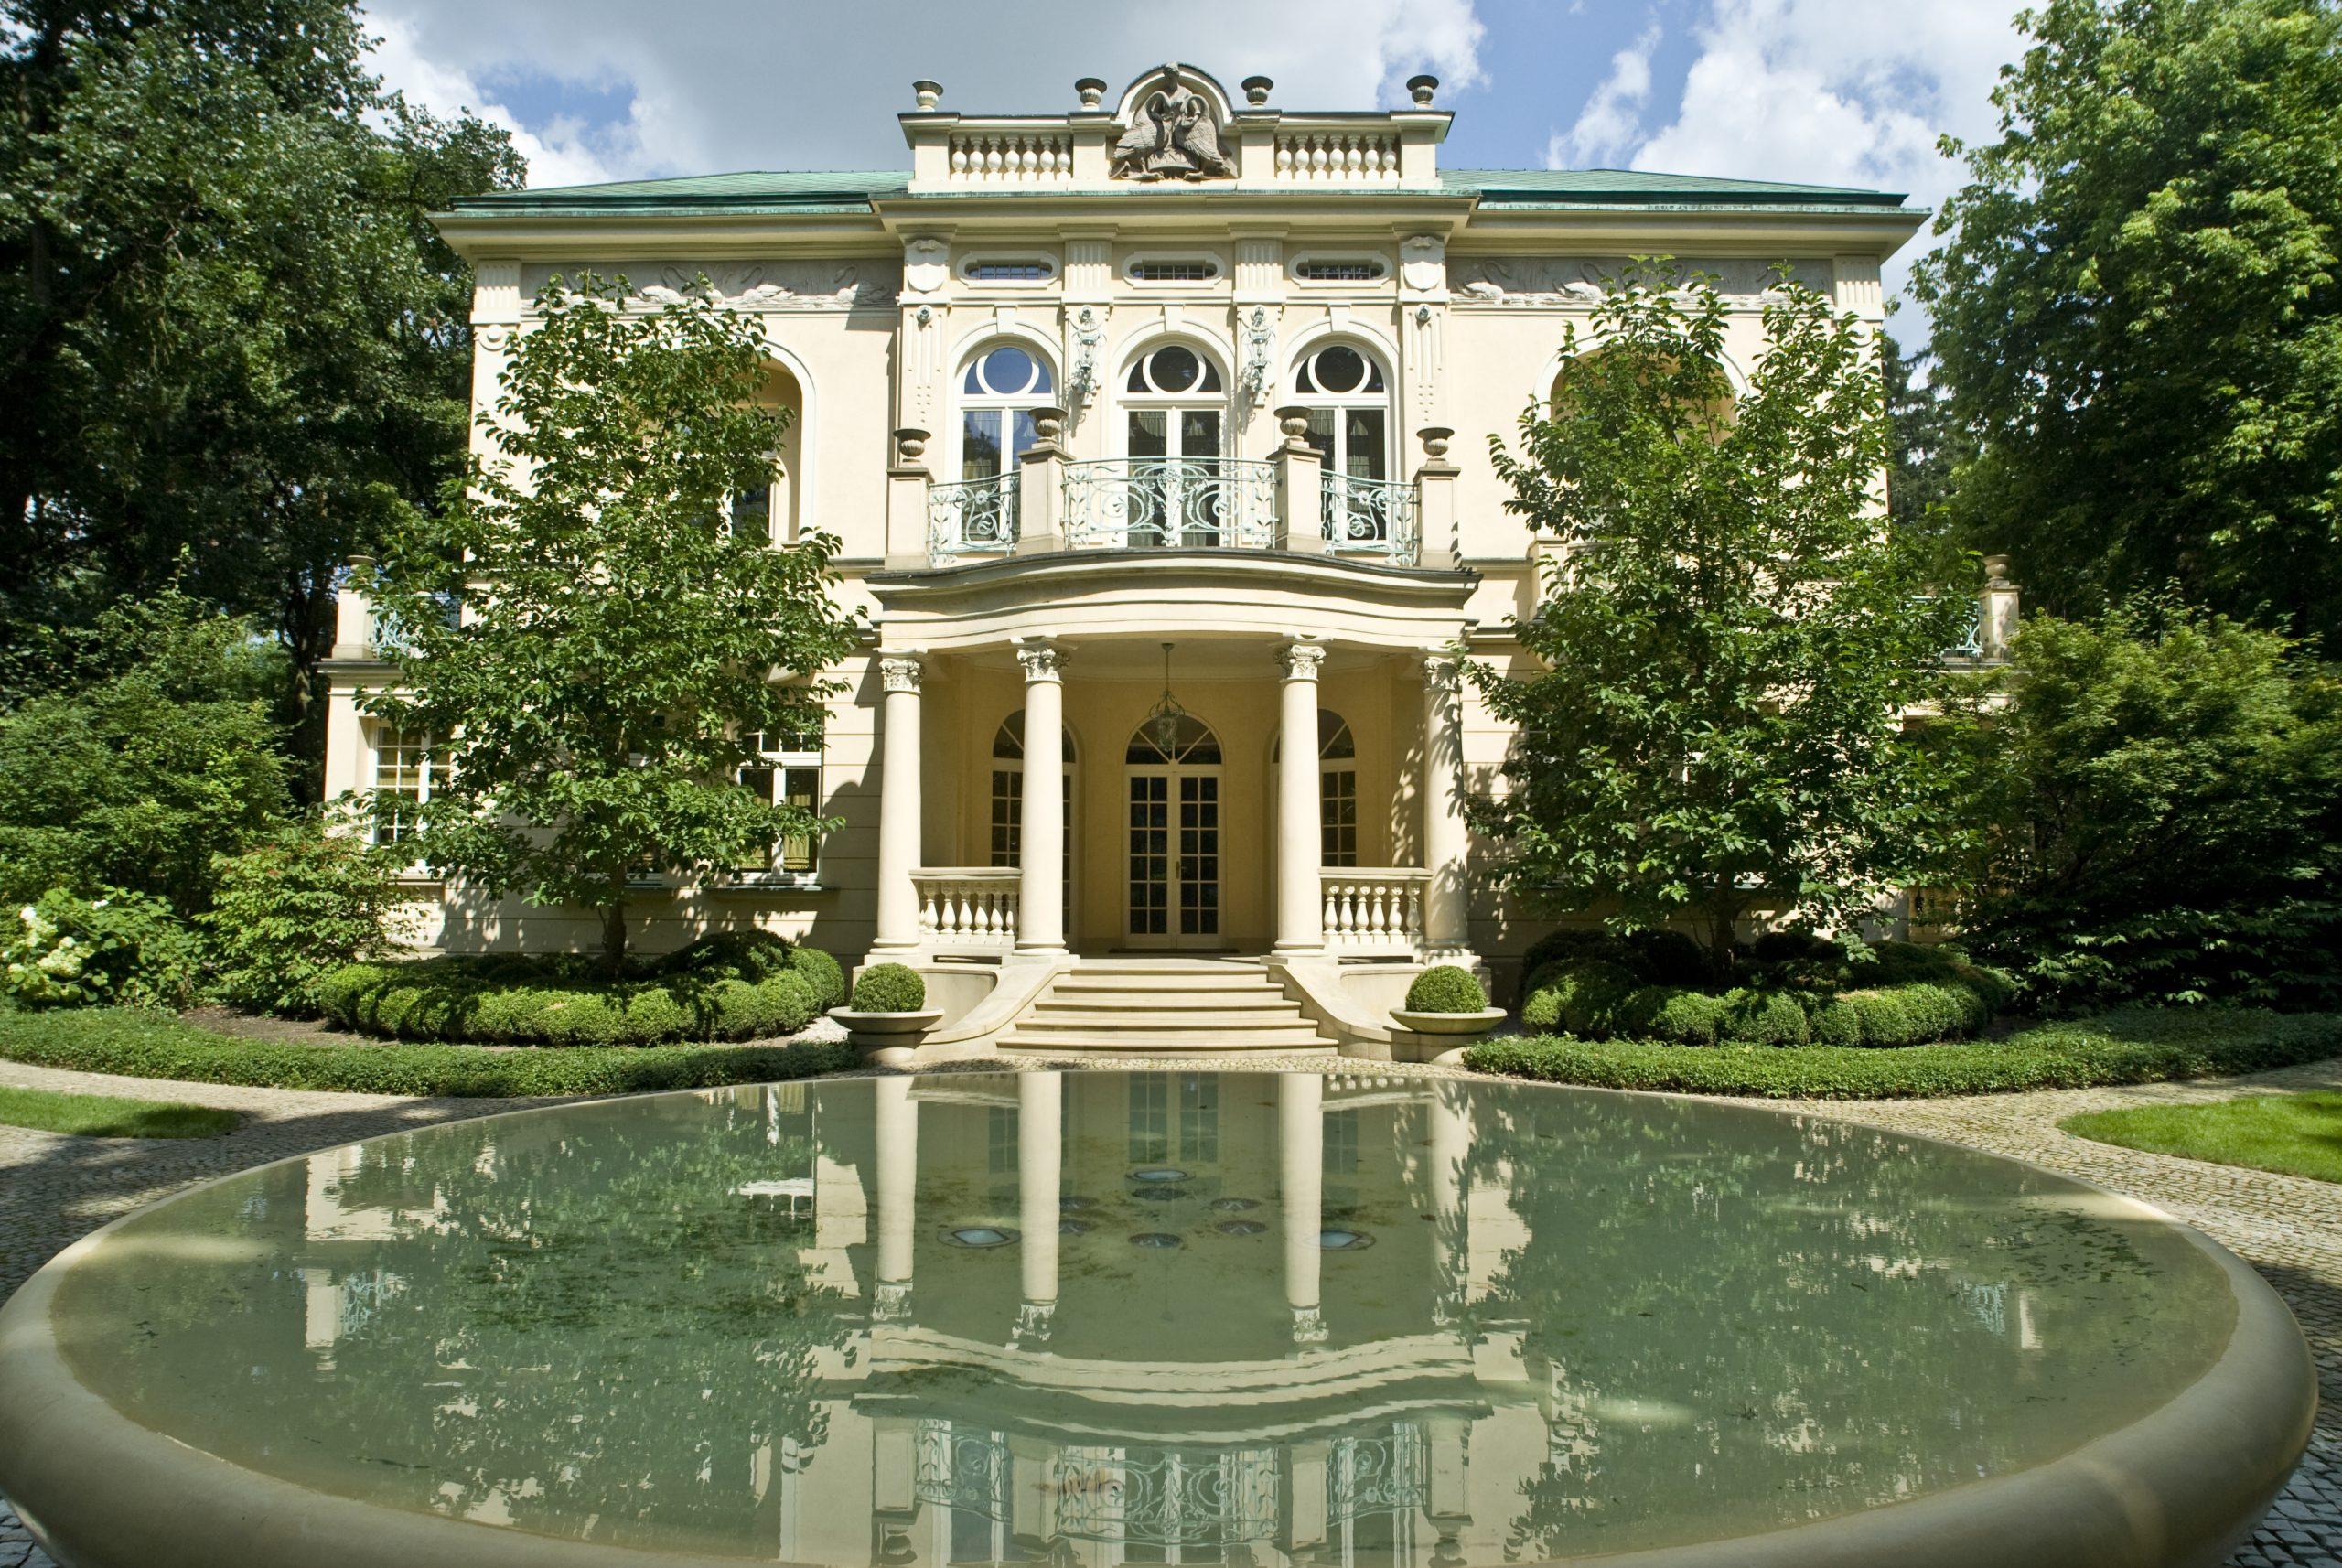 konstancin-jeziorna-villa-wanda